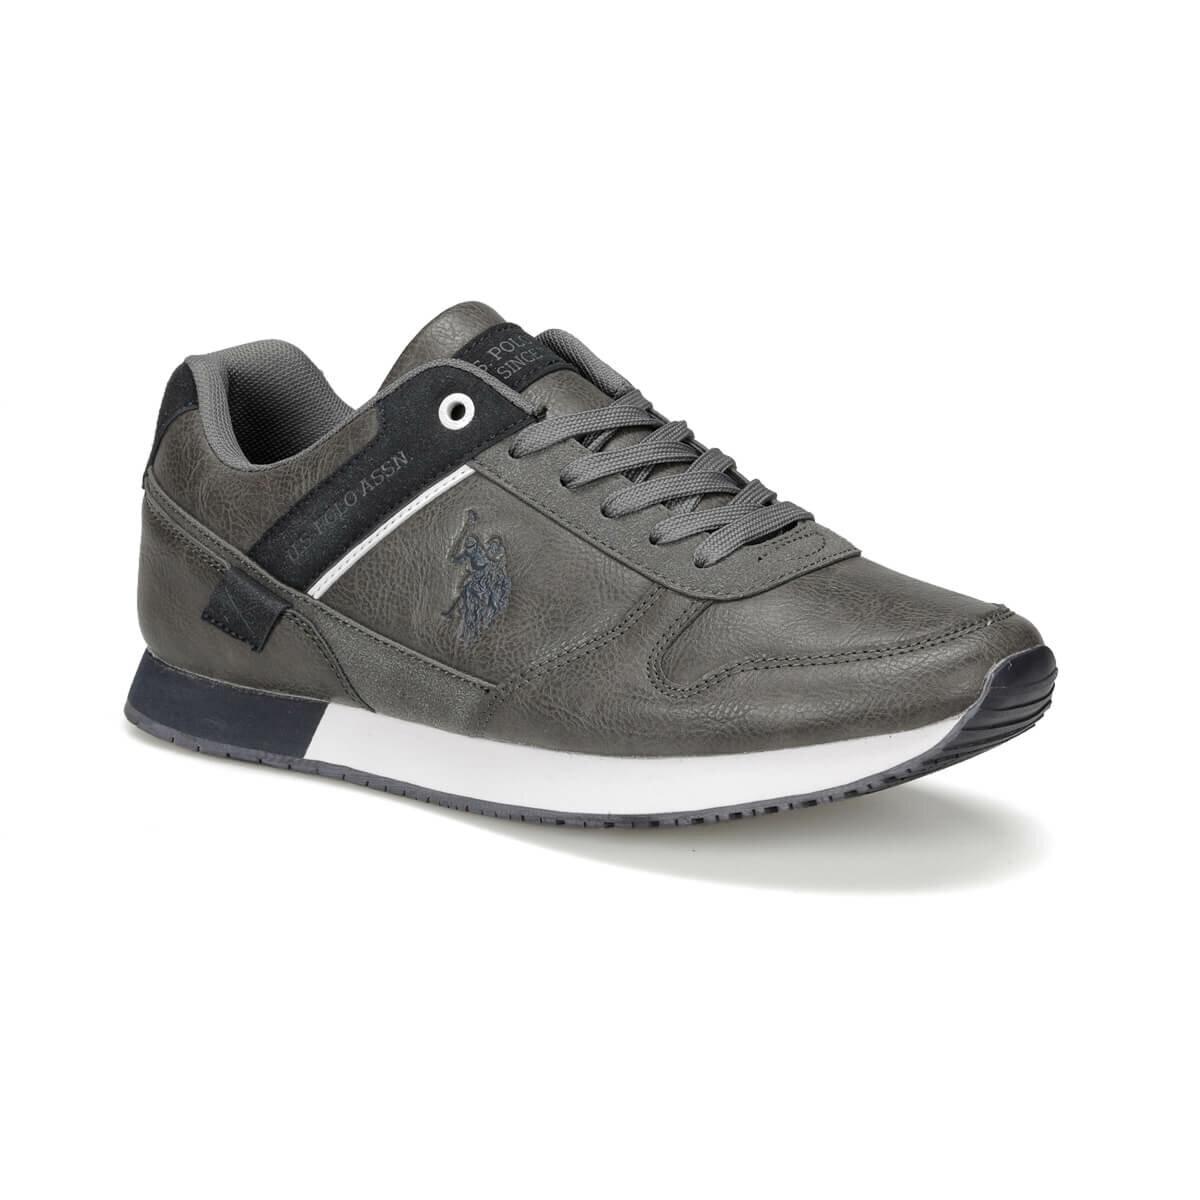 FLO FORTH 9PR Gray Men 'S Sneaker Shoes U.S. POLO ASSN.